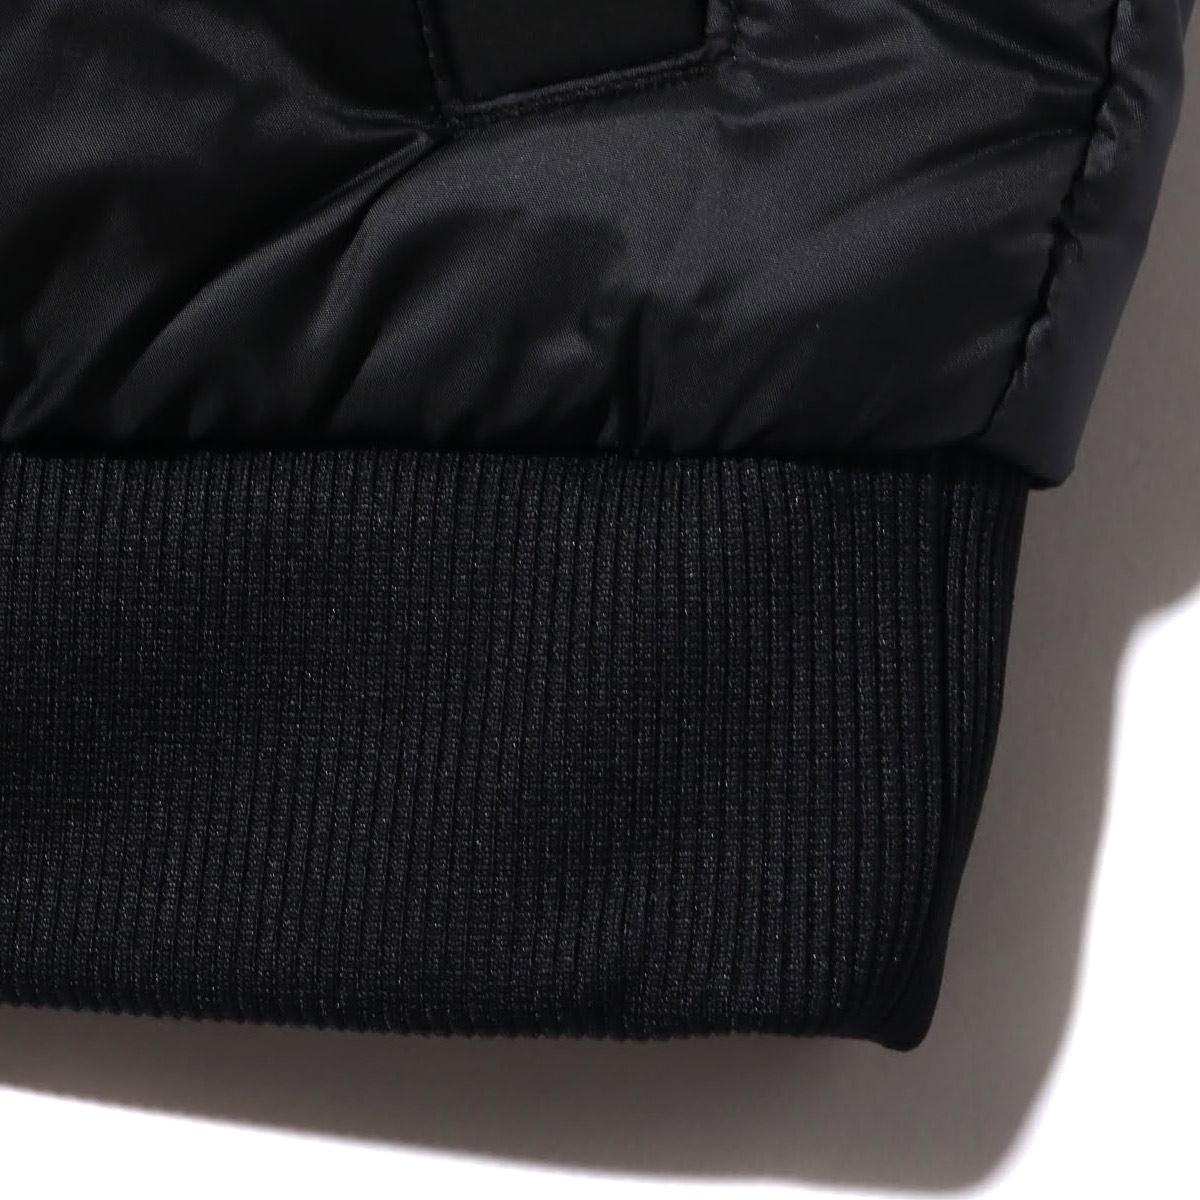 72ef452e12c adidas Originals SST QUILTED JACKET (Adidas originals SST kill Ted jacket)  BLACK 18FW-I